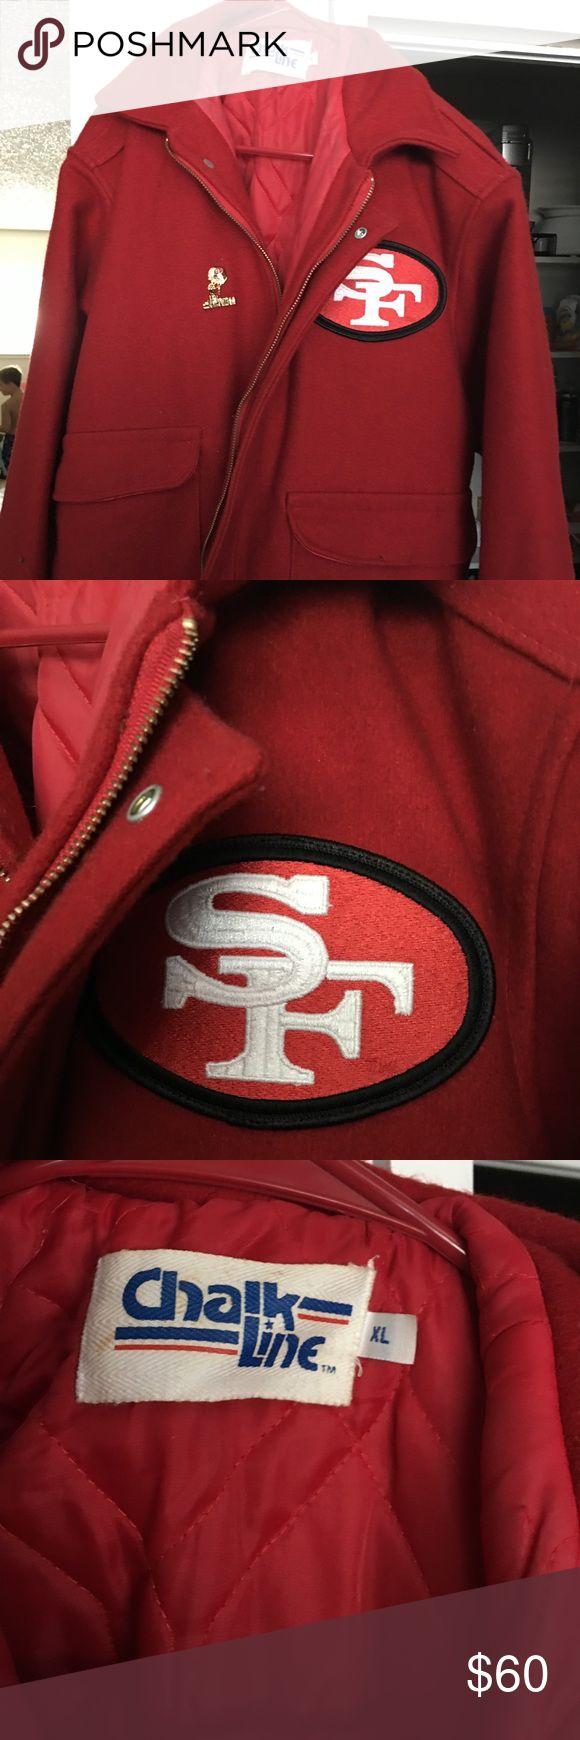 Wool San Francisco 49ers jacket Men's XL red wool San Francisco 49er jacket, excellent condition. Jackets & Coats